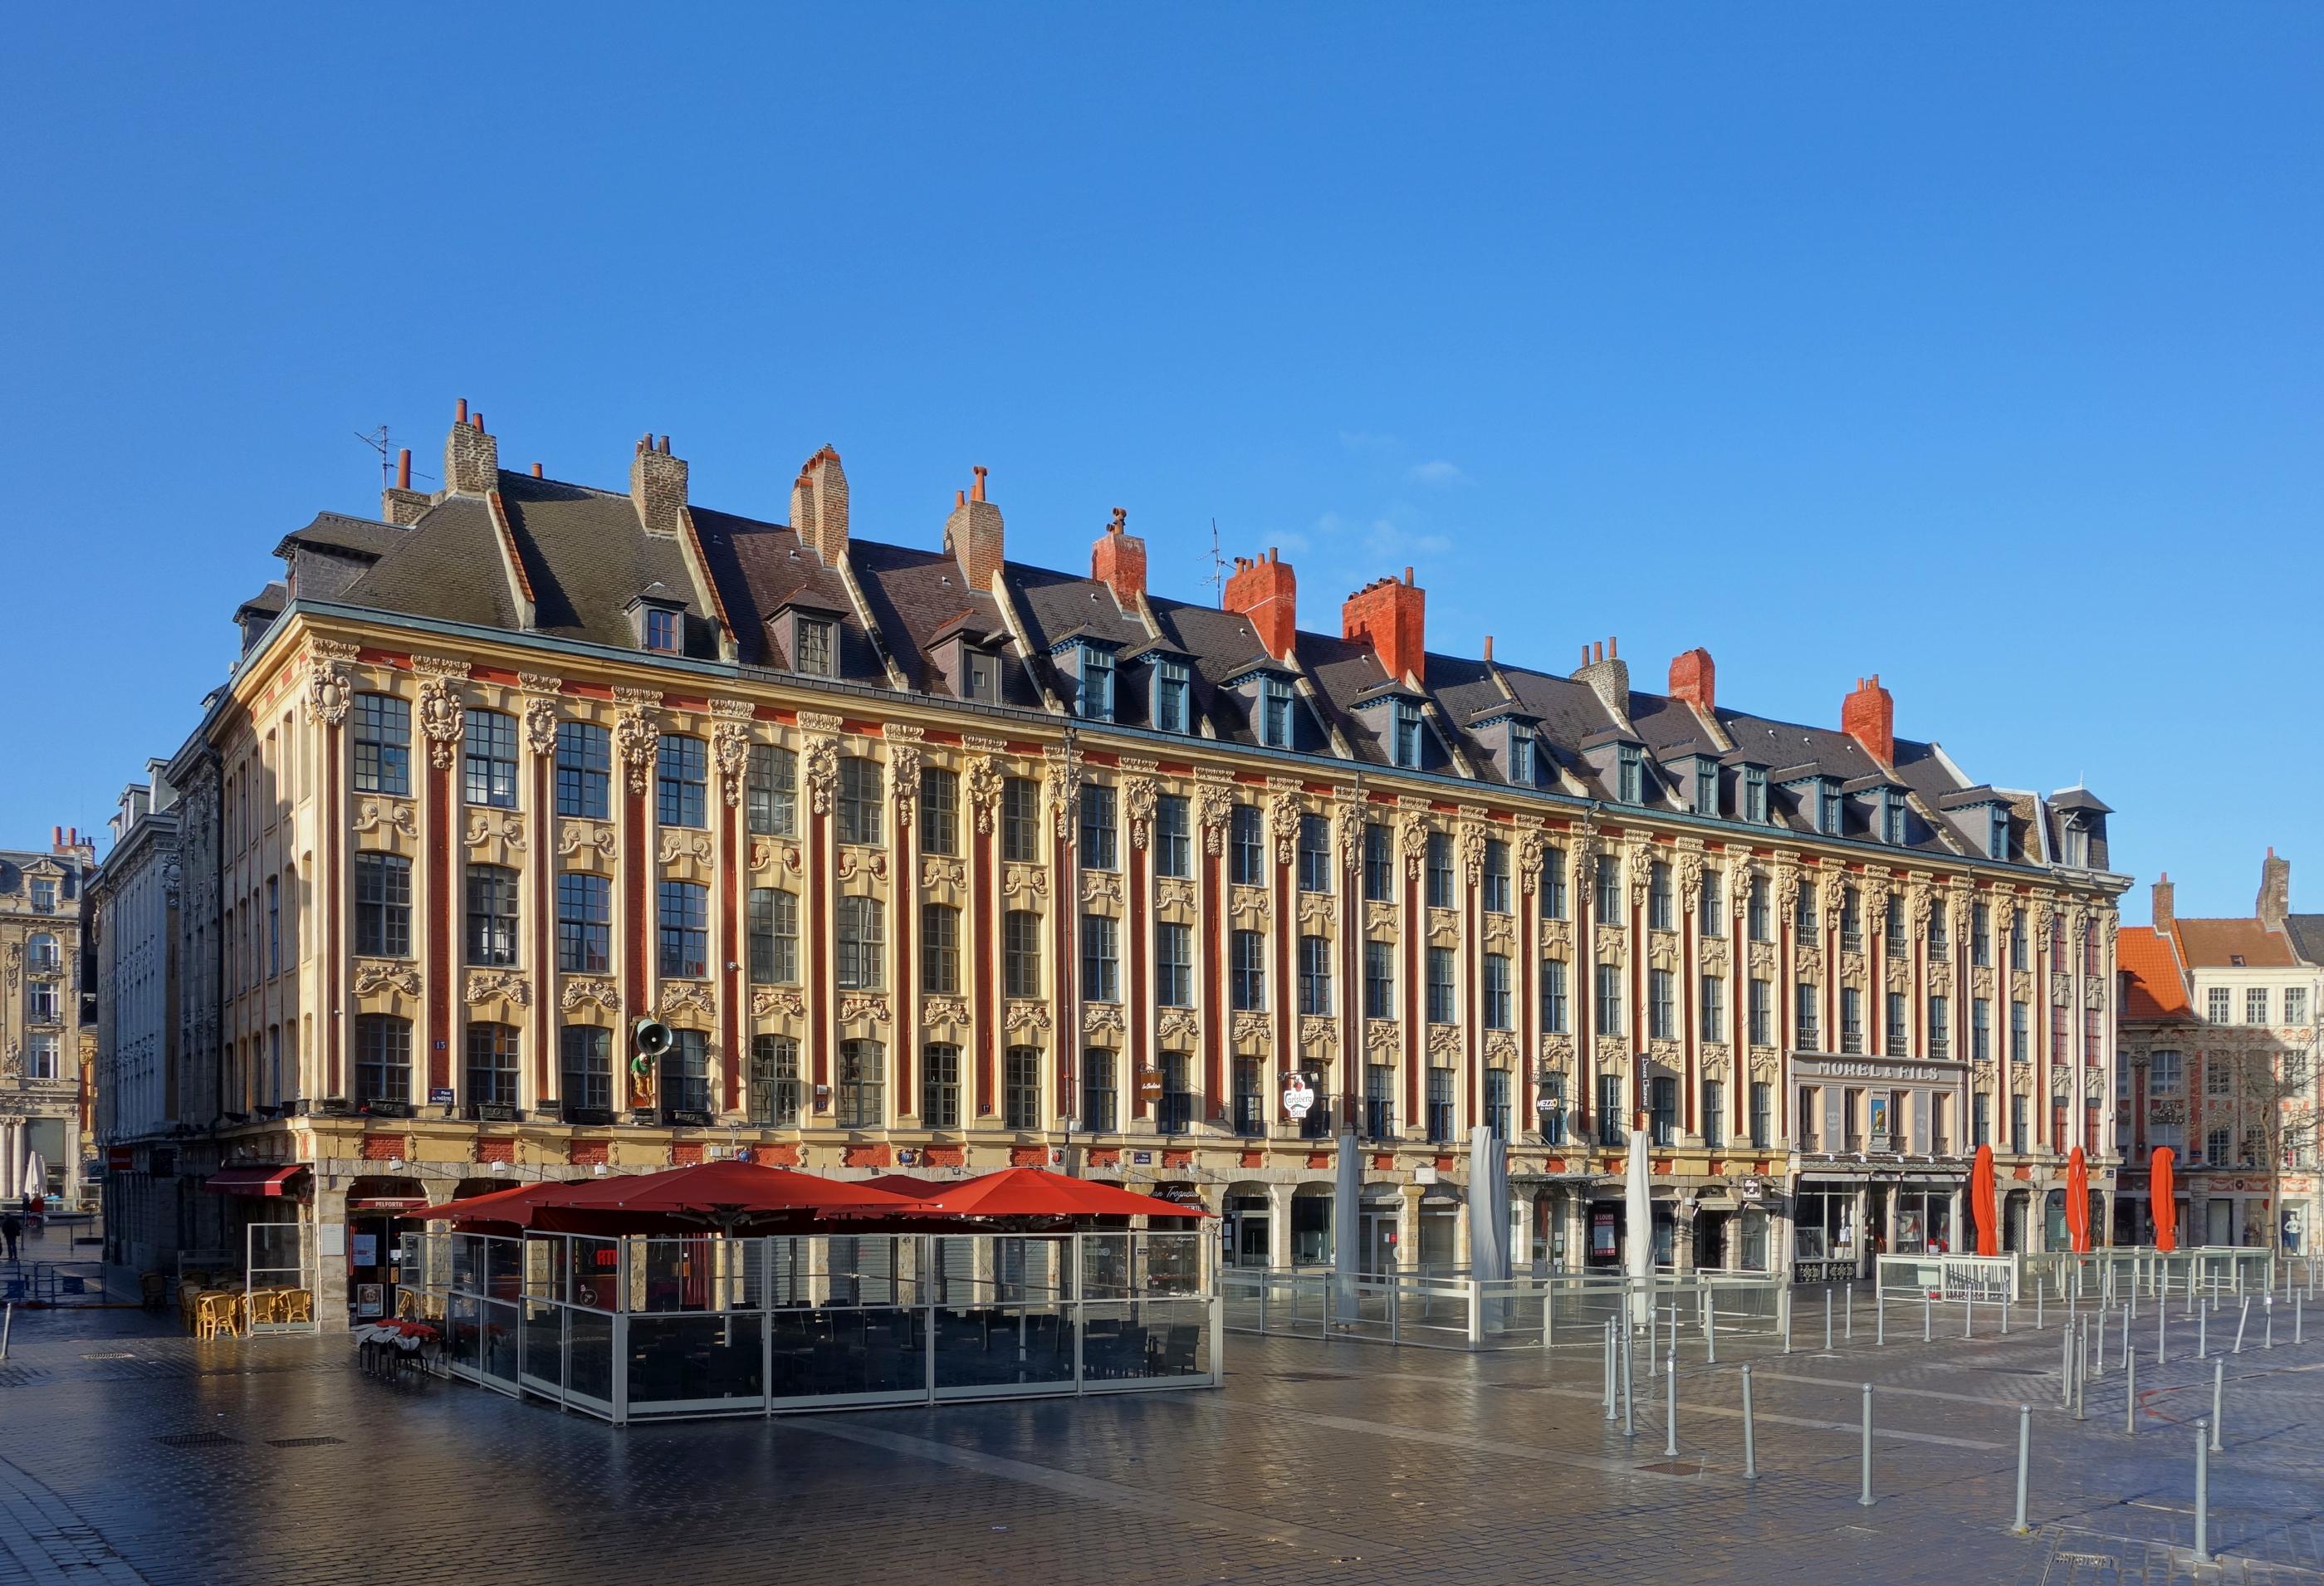 https://upload.wikimedia.org/wikipedia/commons/a/ae/Lille_rang_du_beauregard.jpg